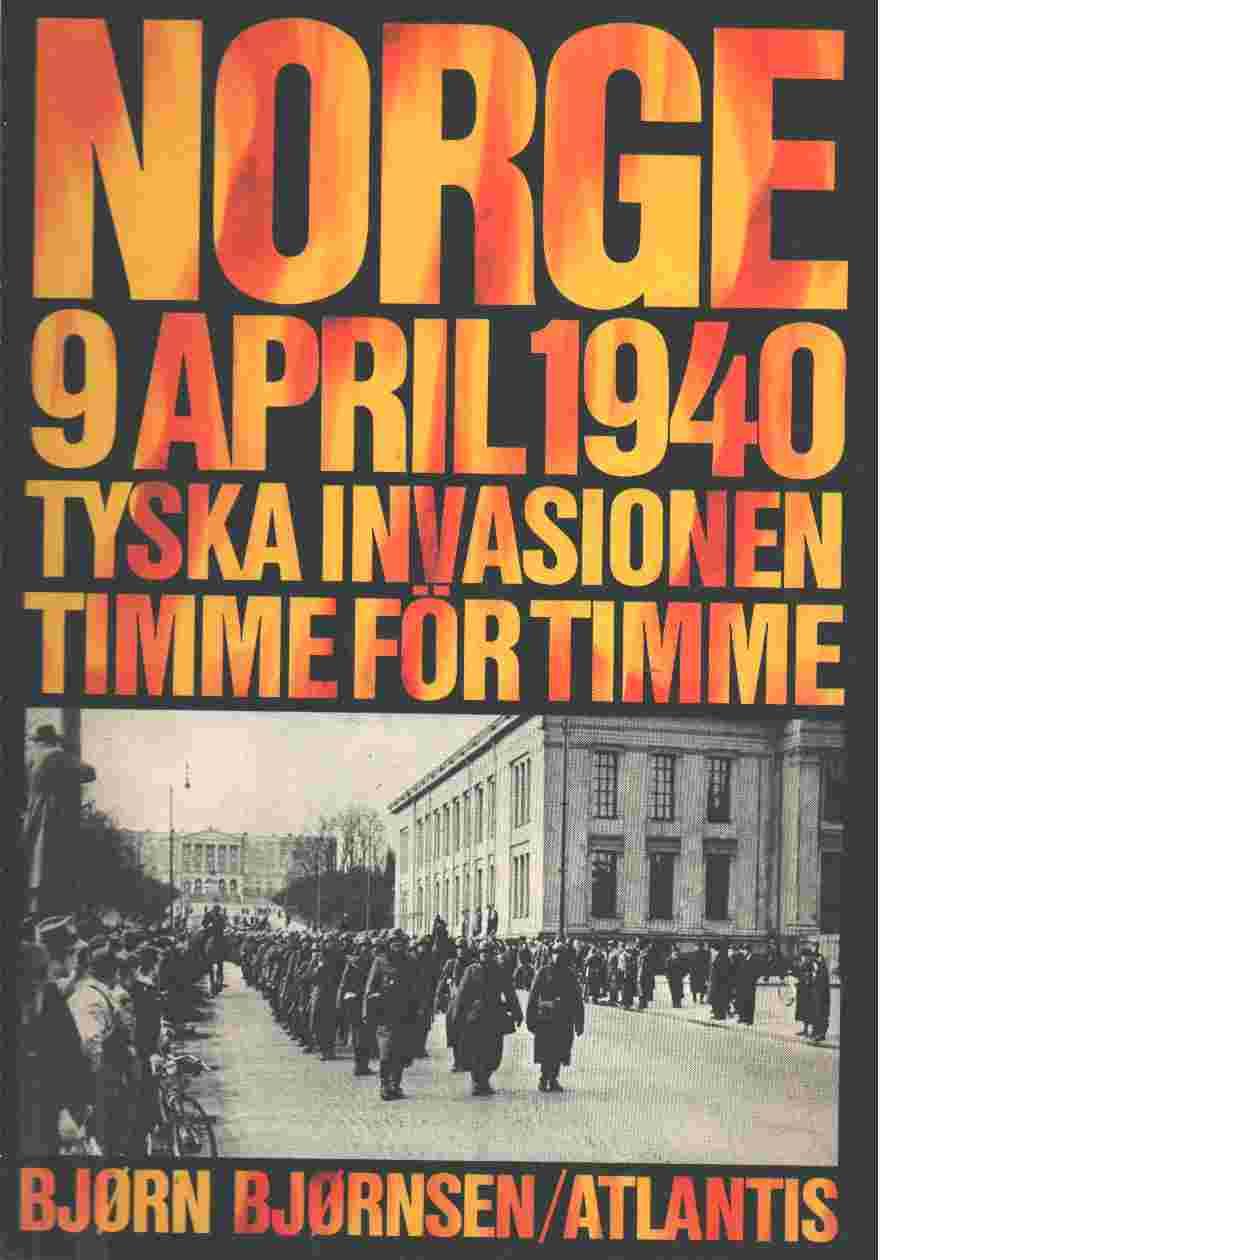 Norge 9 april 1940   tyska invasionen timme för timme - Bjørnsen, Bjørn